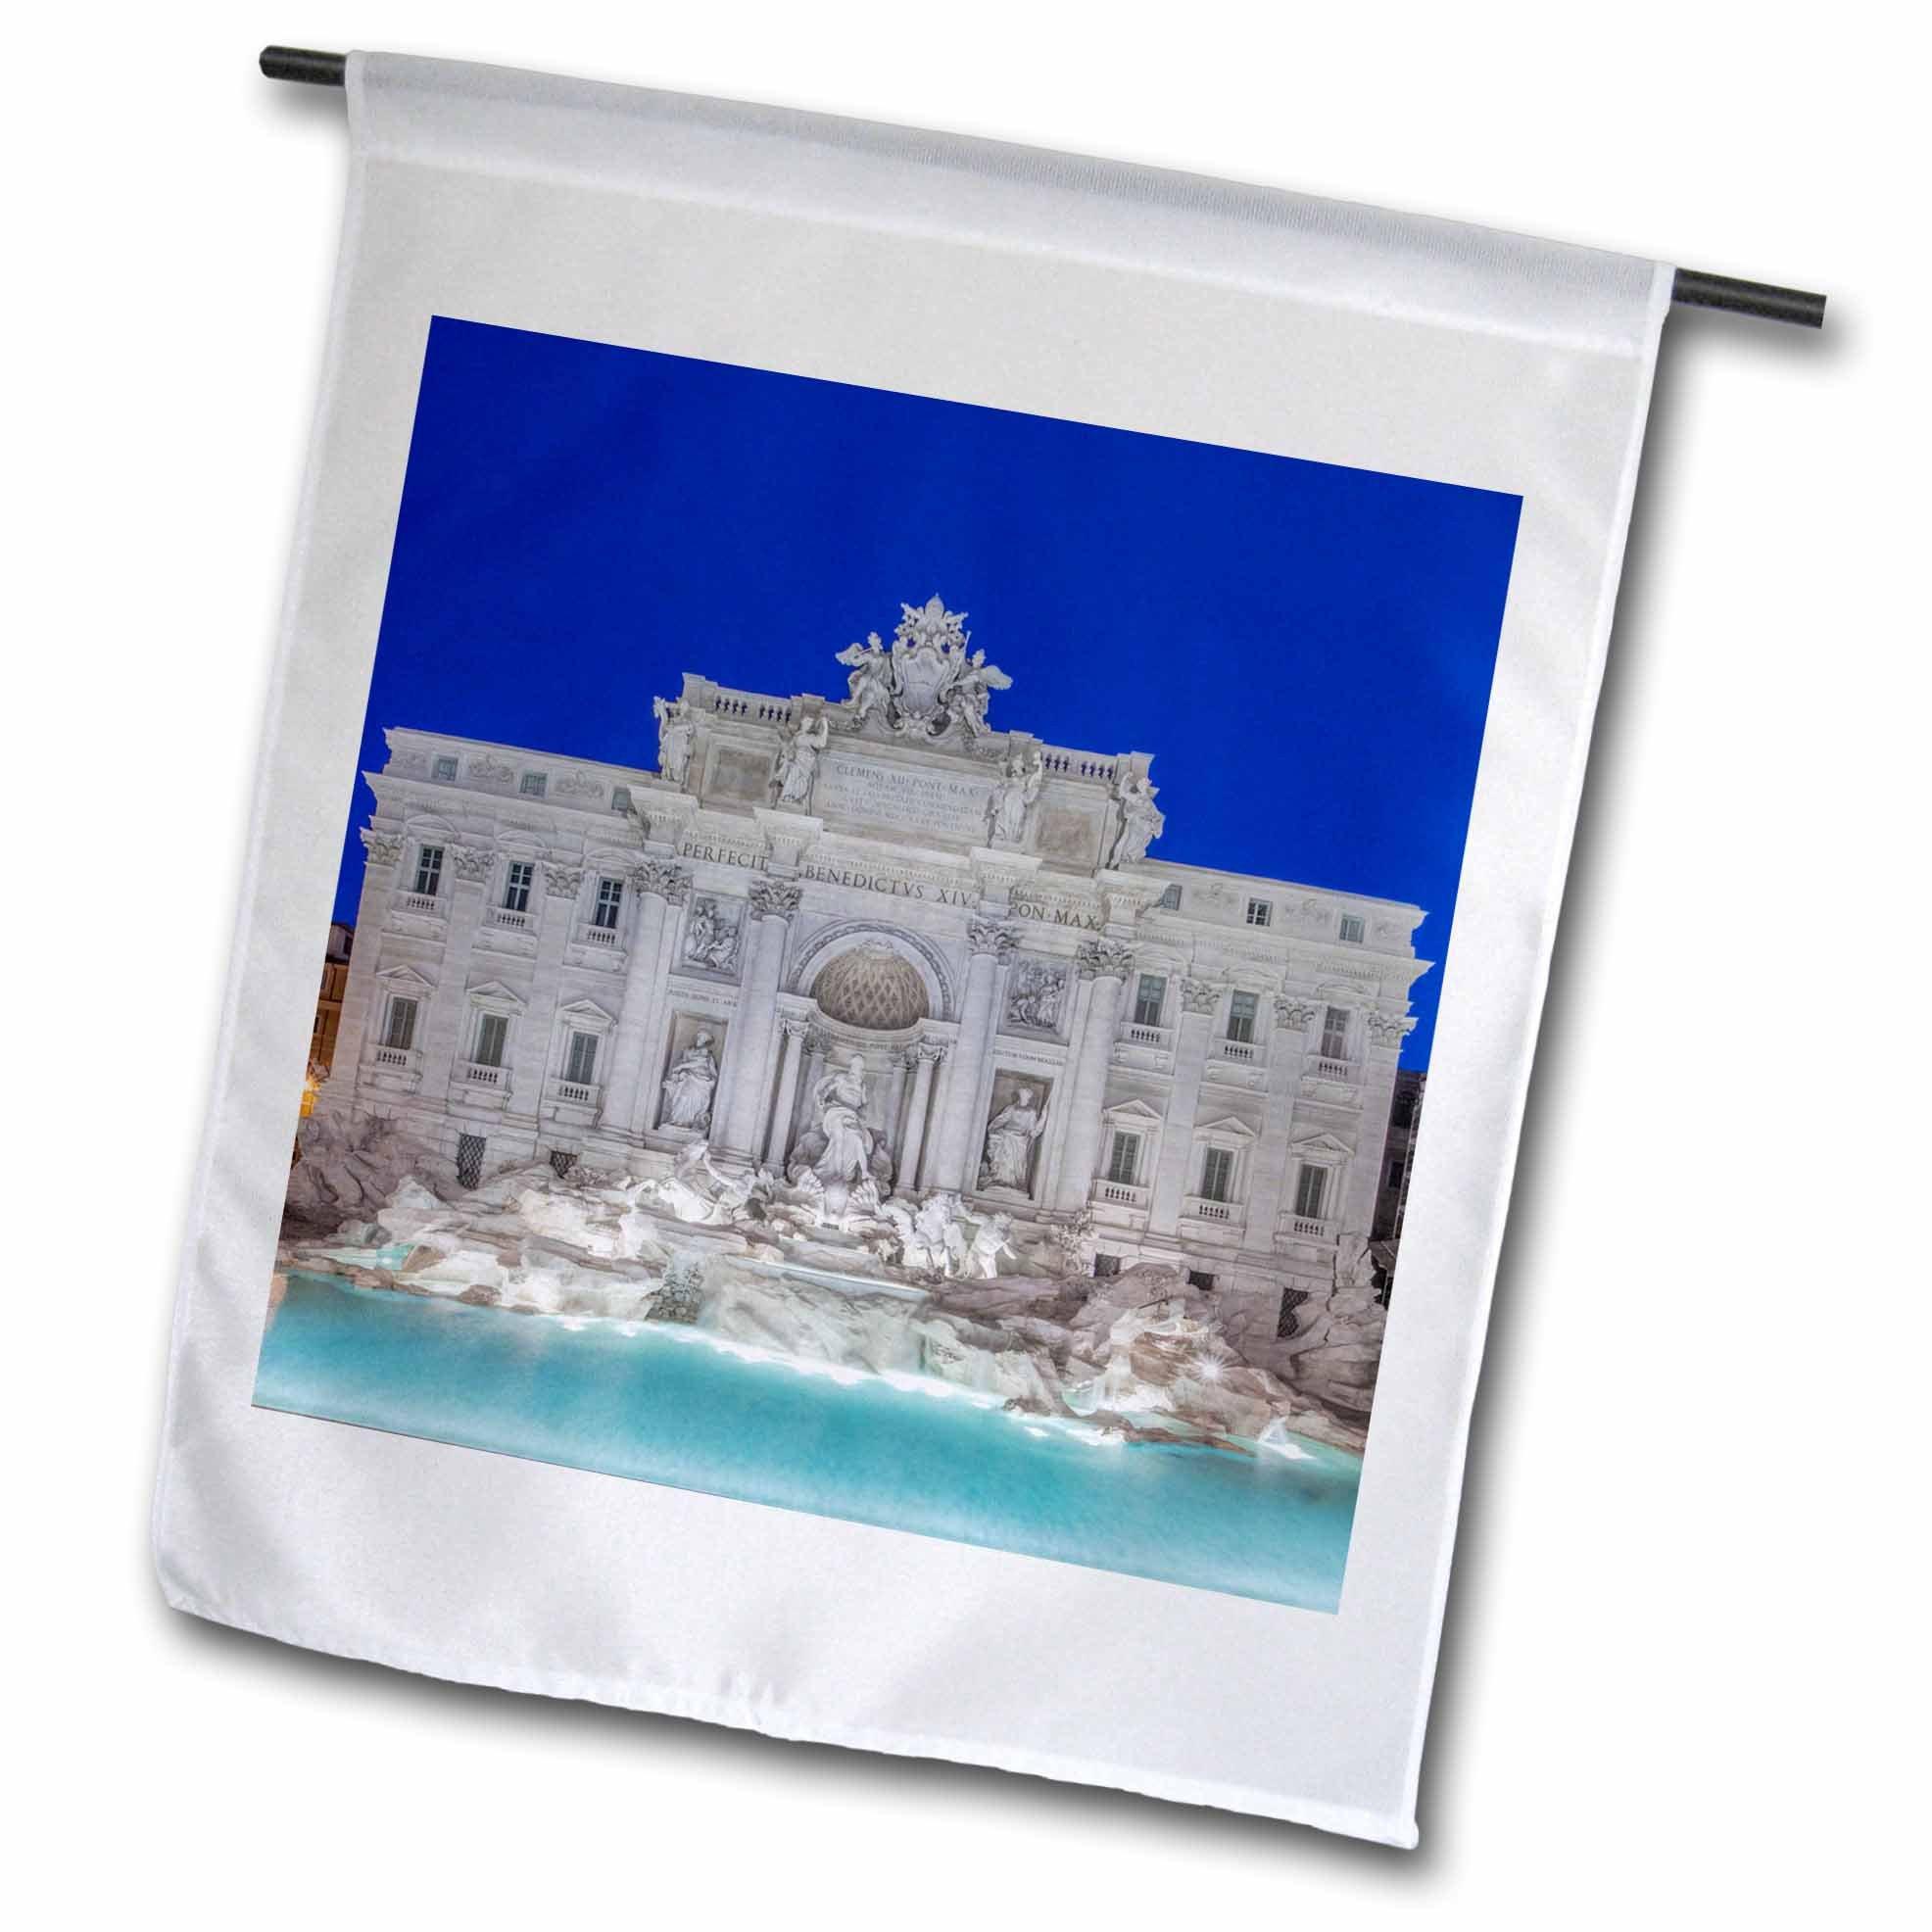 3dRose Danita Delimont - Fountains - Italy, Rome, Trevi Fountain. - 18 x 27 inch Garden Flag (fl_277655_2)